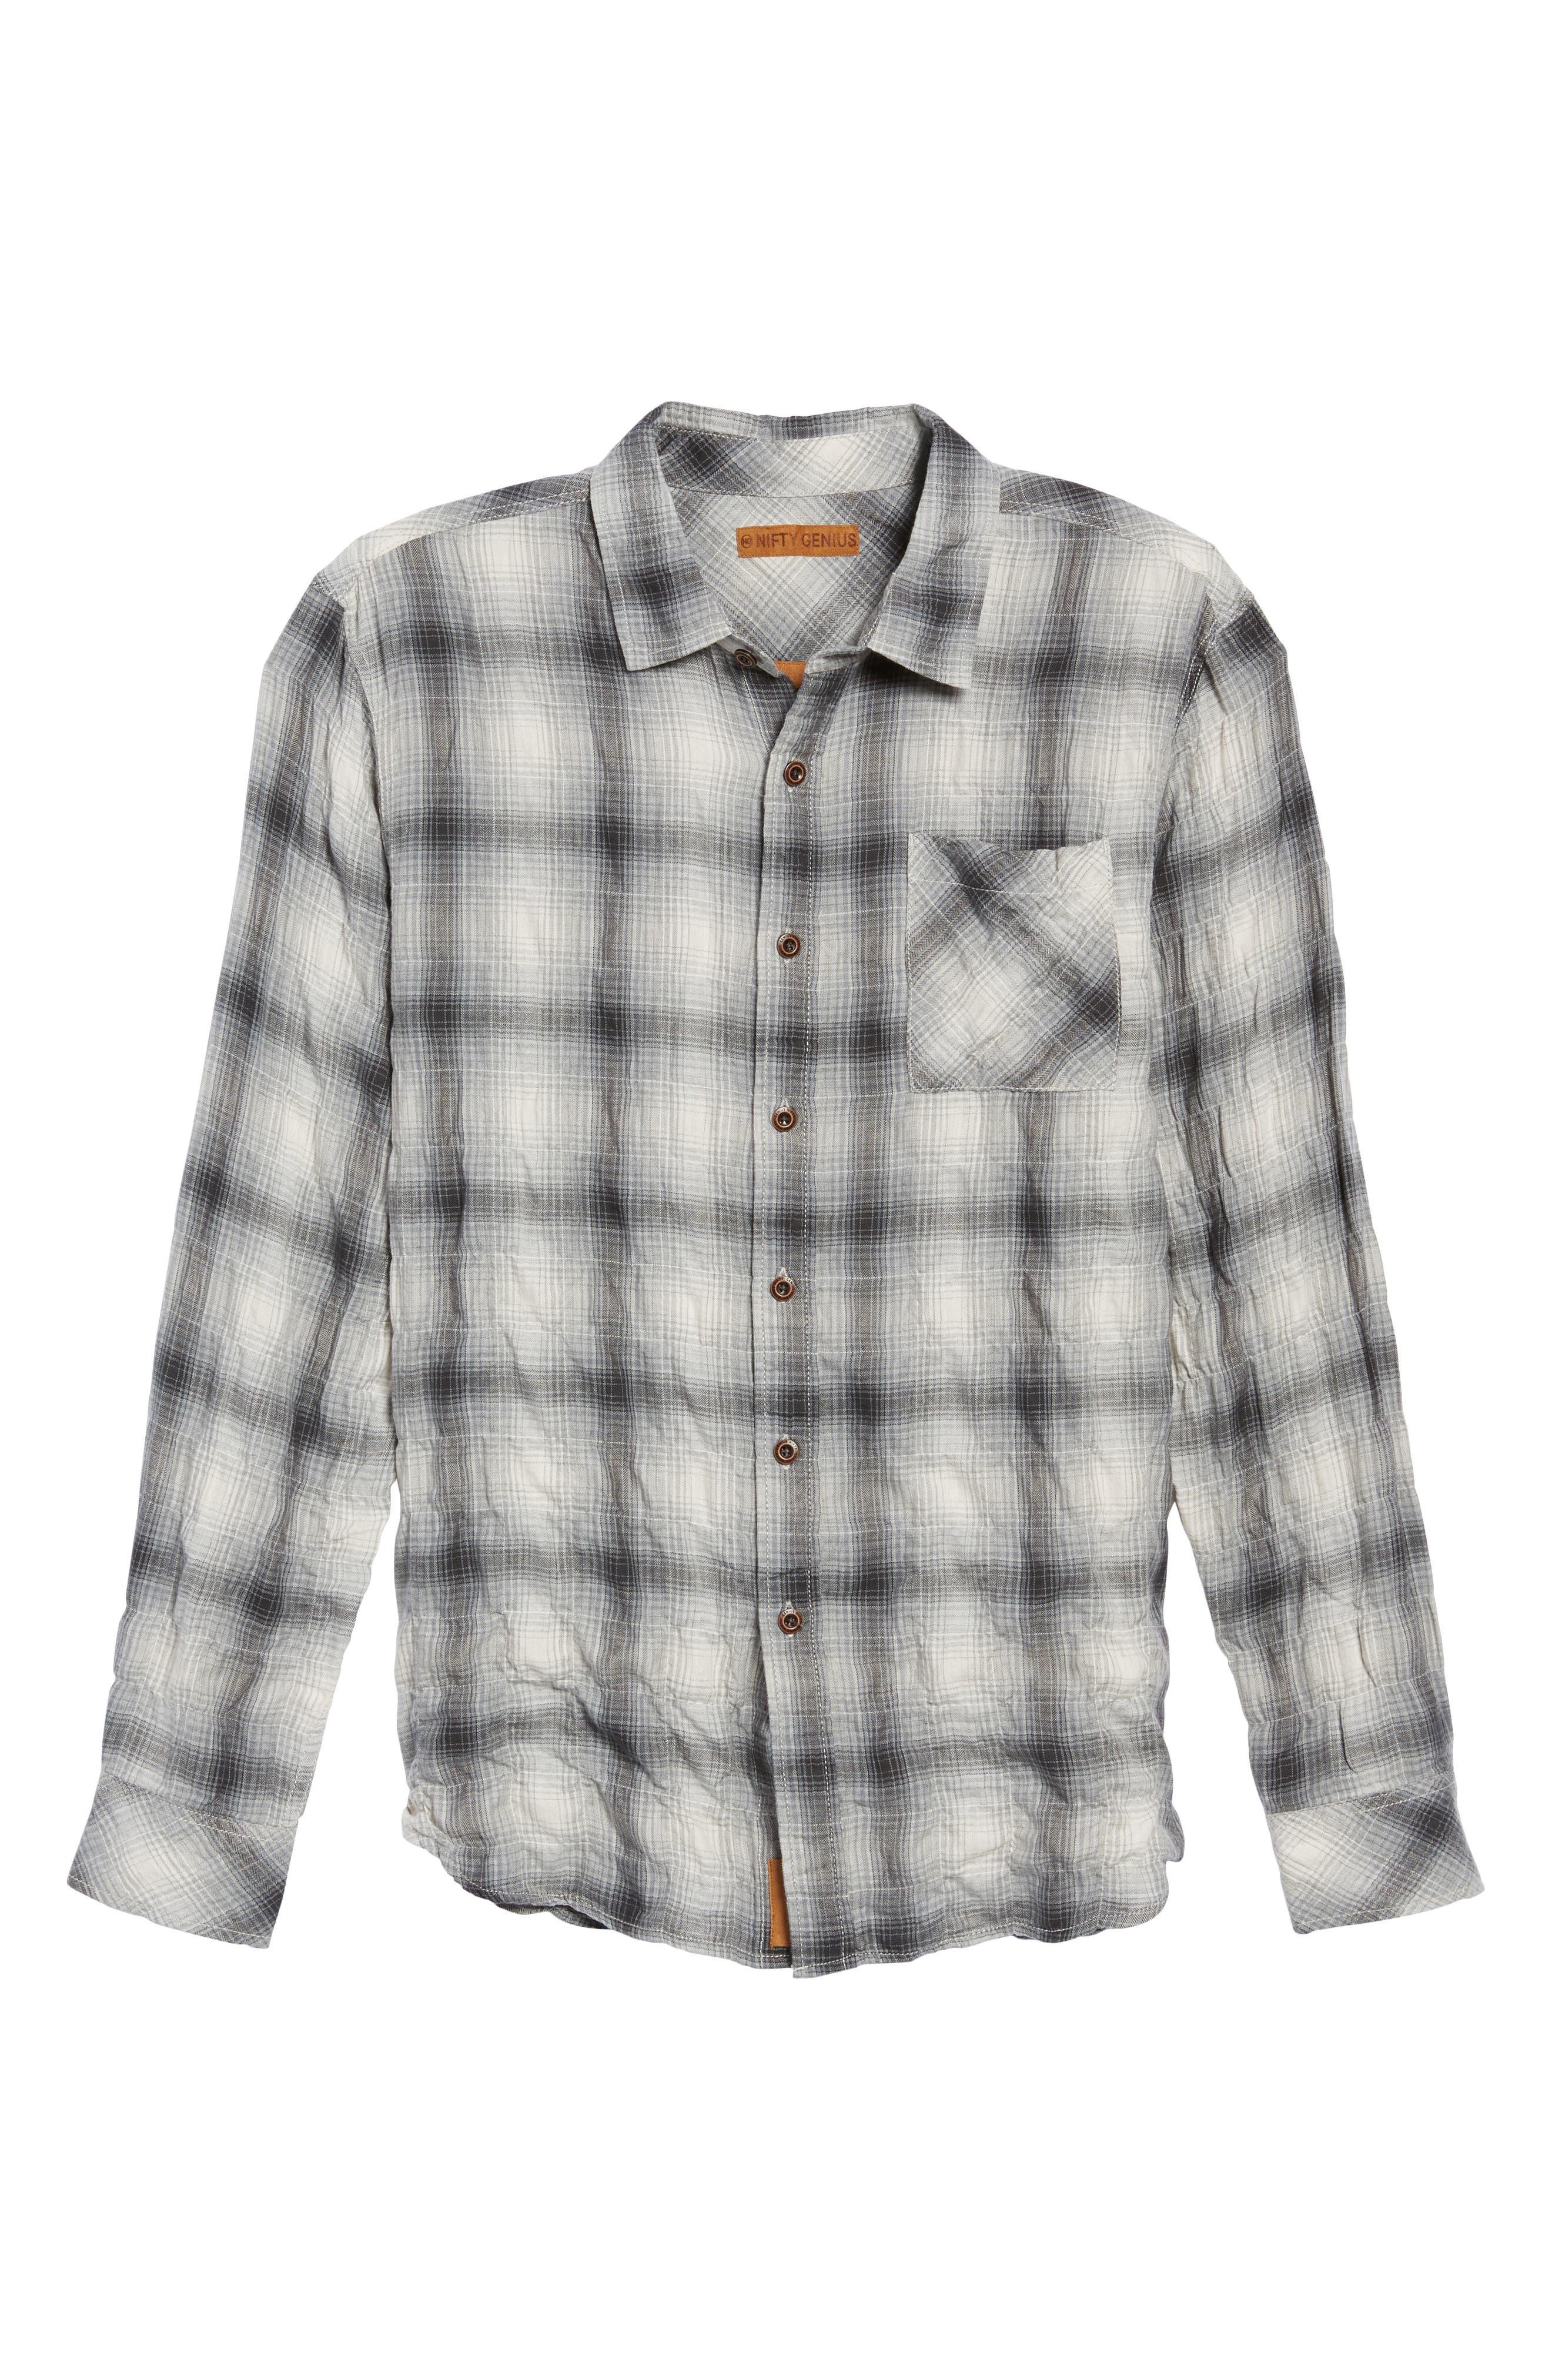 Truman Plaid Sport Shirt,                             Alternate thumbnail 6, color,                             020